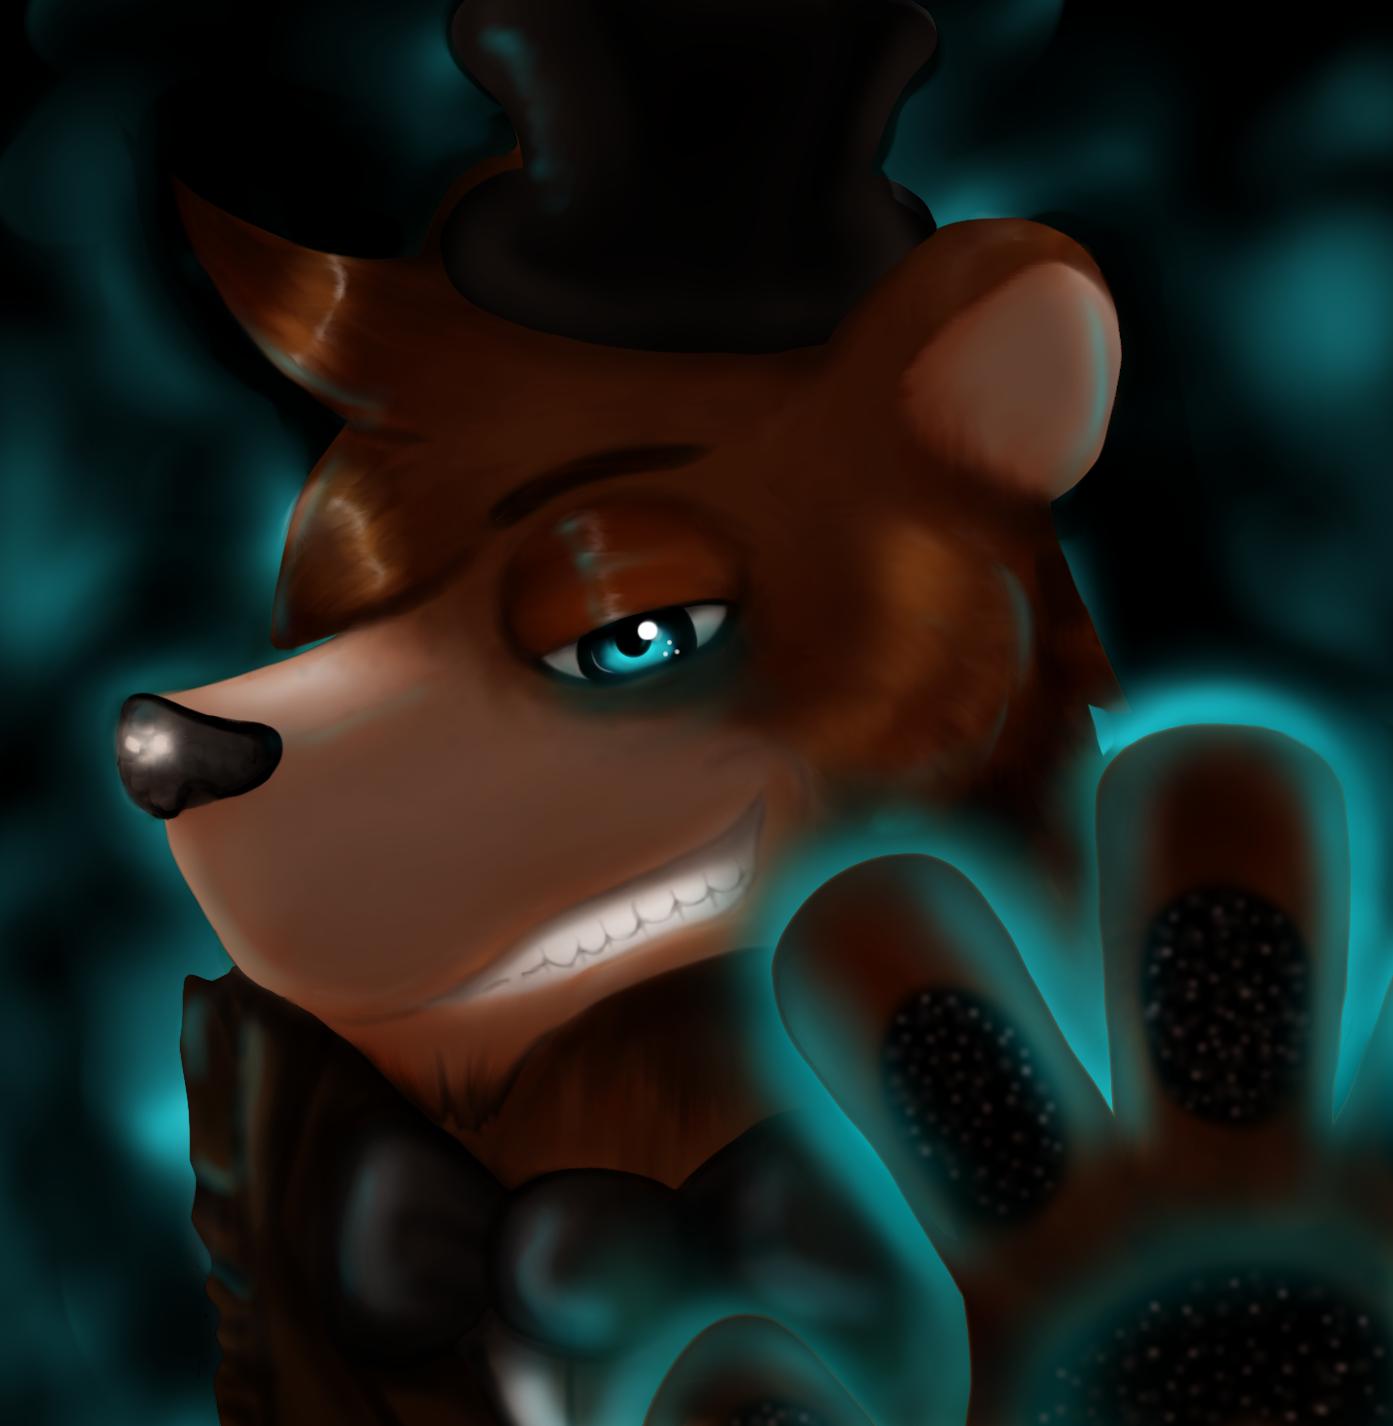 Freddy Fazbear FNaF By AskTheFazbearCrew On DeviantArt